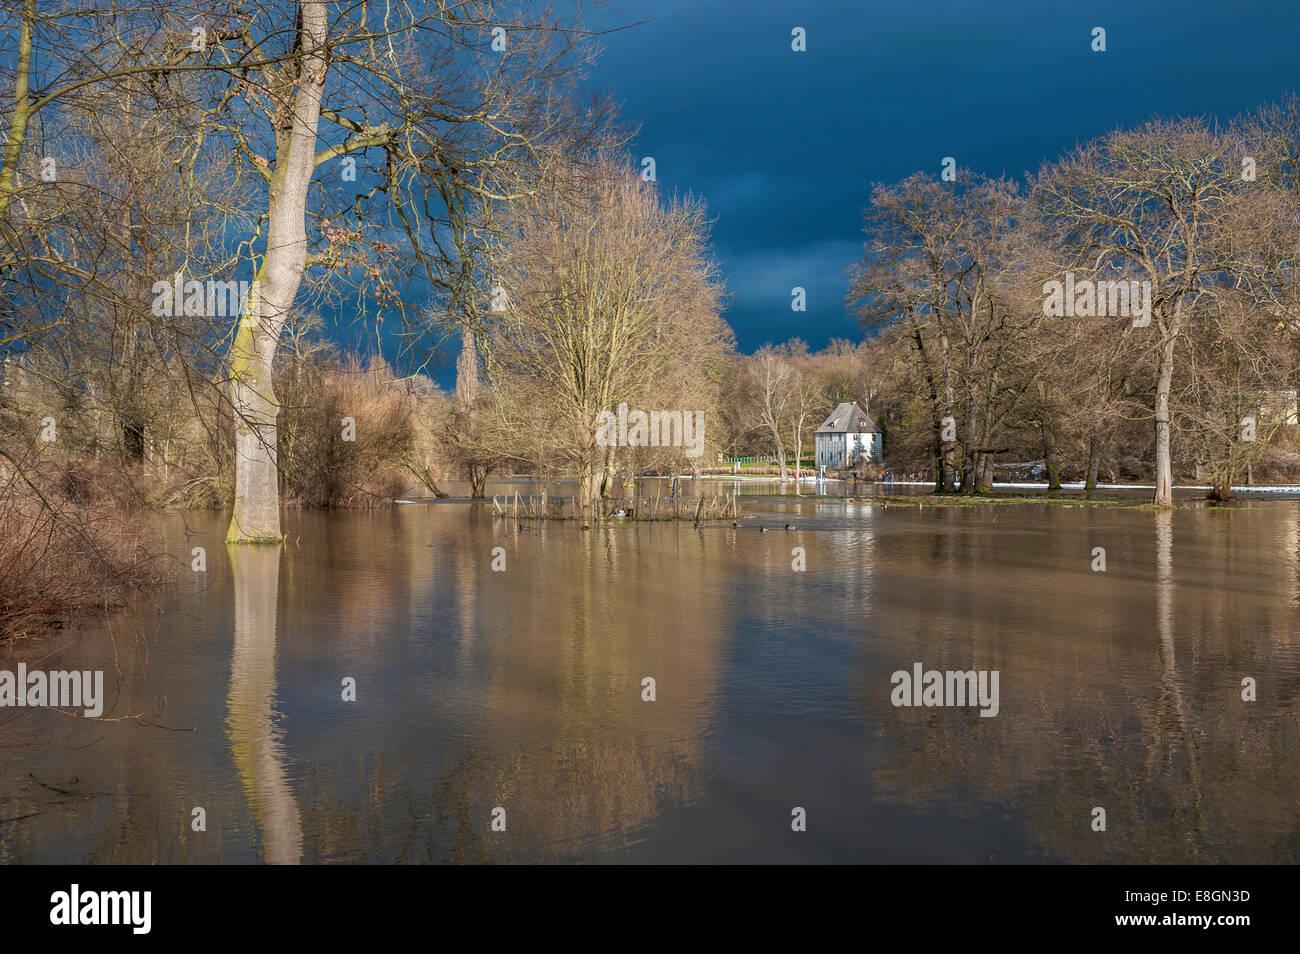 Flooded Garden Stock Photos & Flooded Garden Stock Images - Alamy